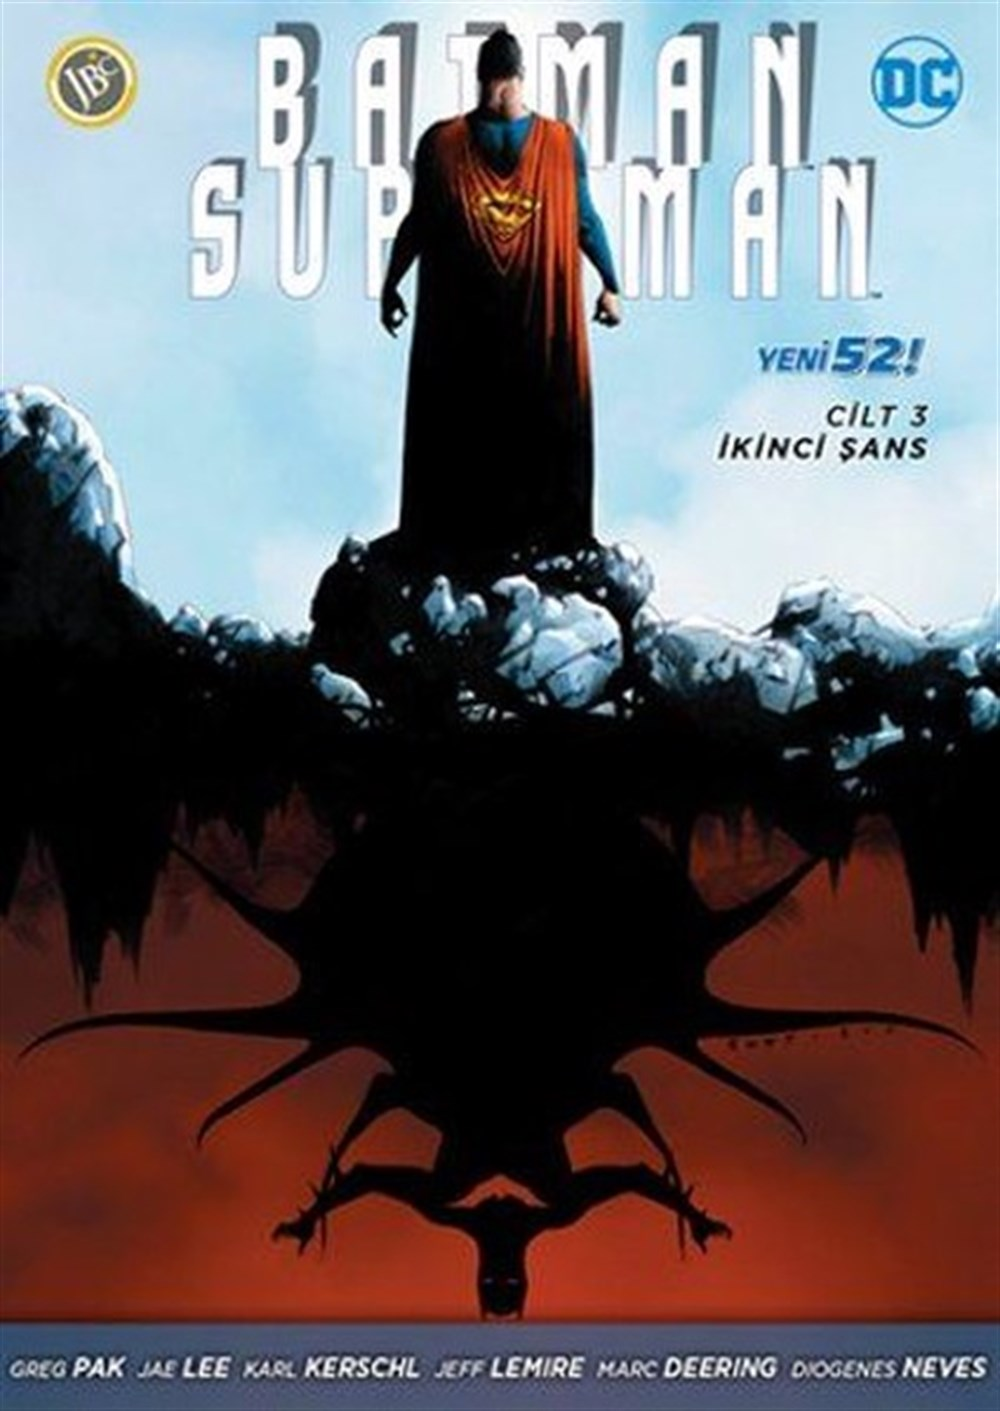 Batman Superman Yeni 52 Cilt 3: İkinci Şans